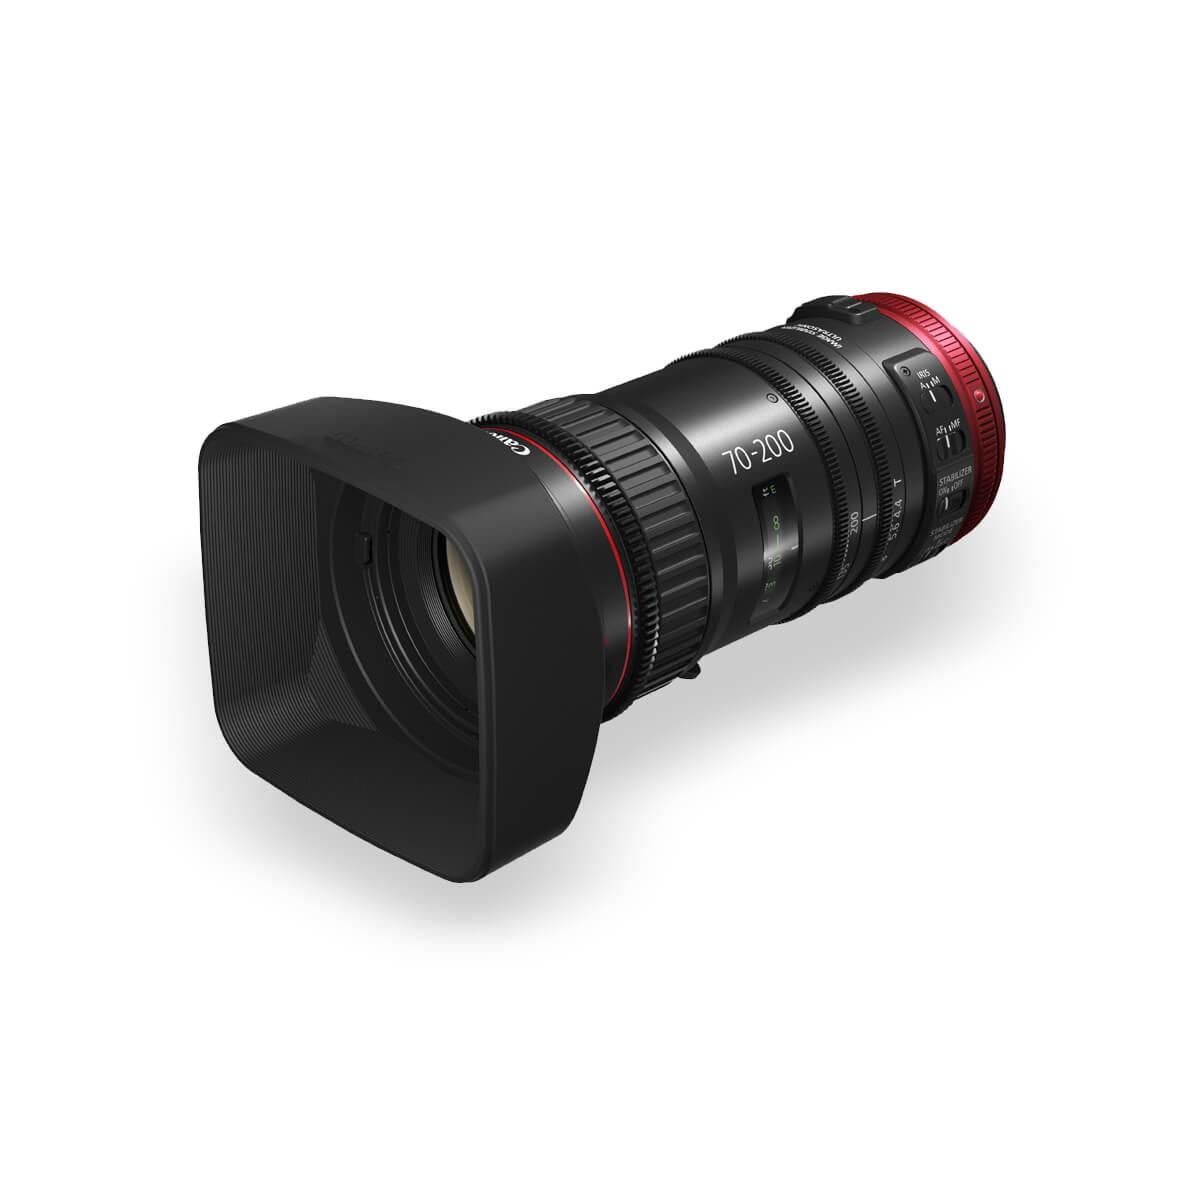 Product image of Canon CN E70-200 T4.4 cinema lens